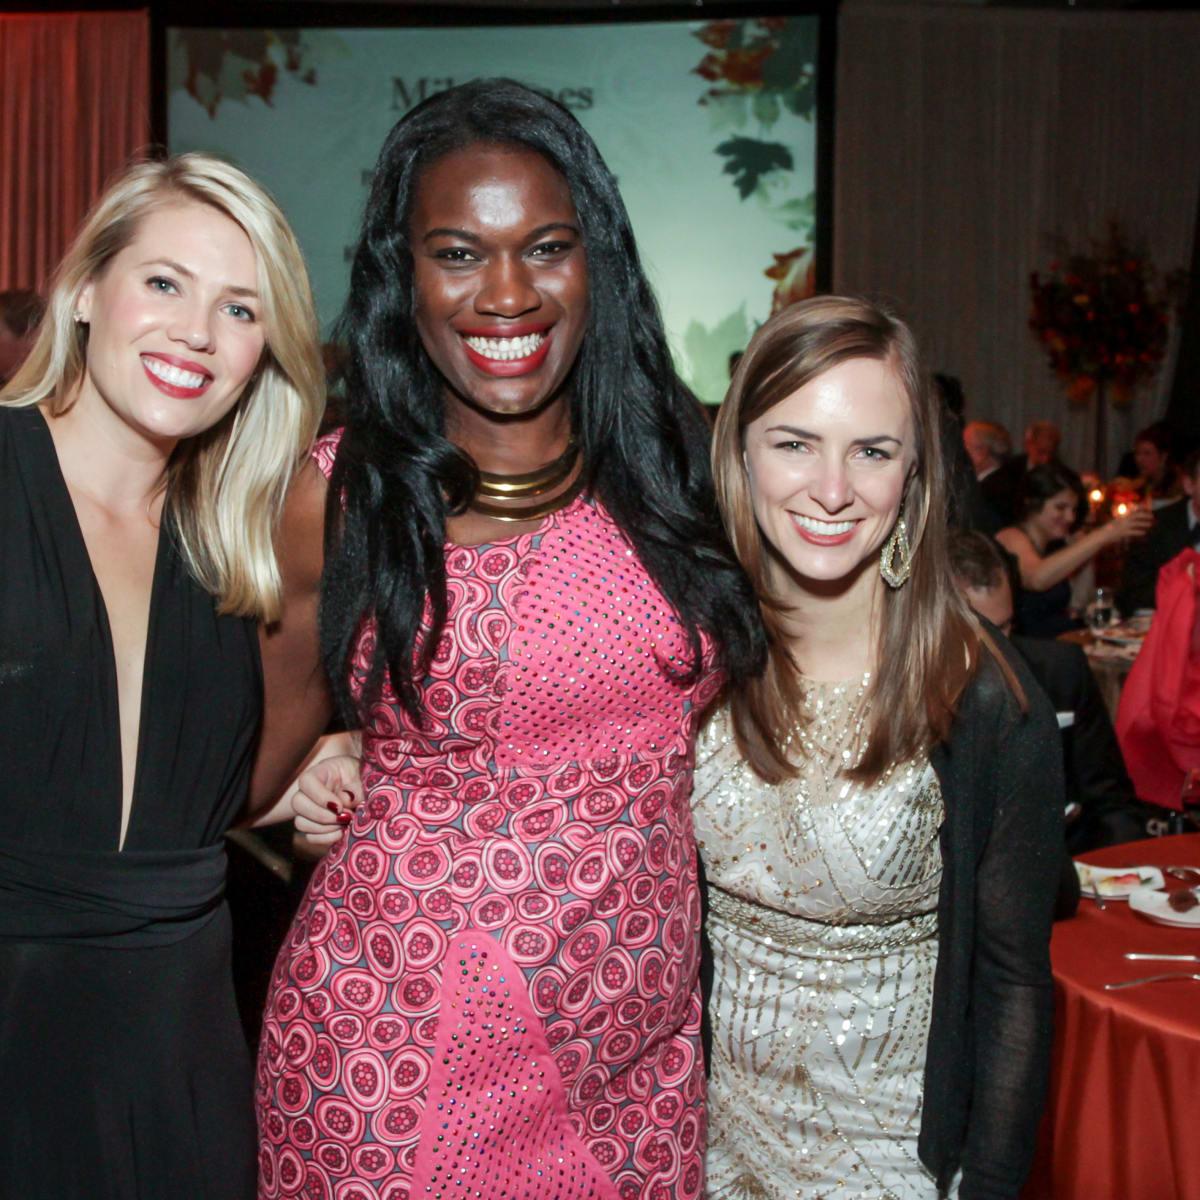 News, Shelby, Women's Home gala, Nov. 2015,  Stephanie McGraw, Yvette Owo, Meaghan Yorro